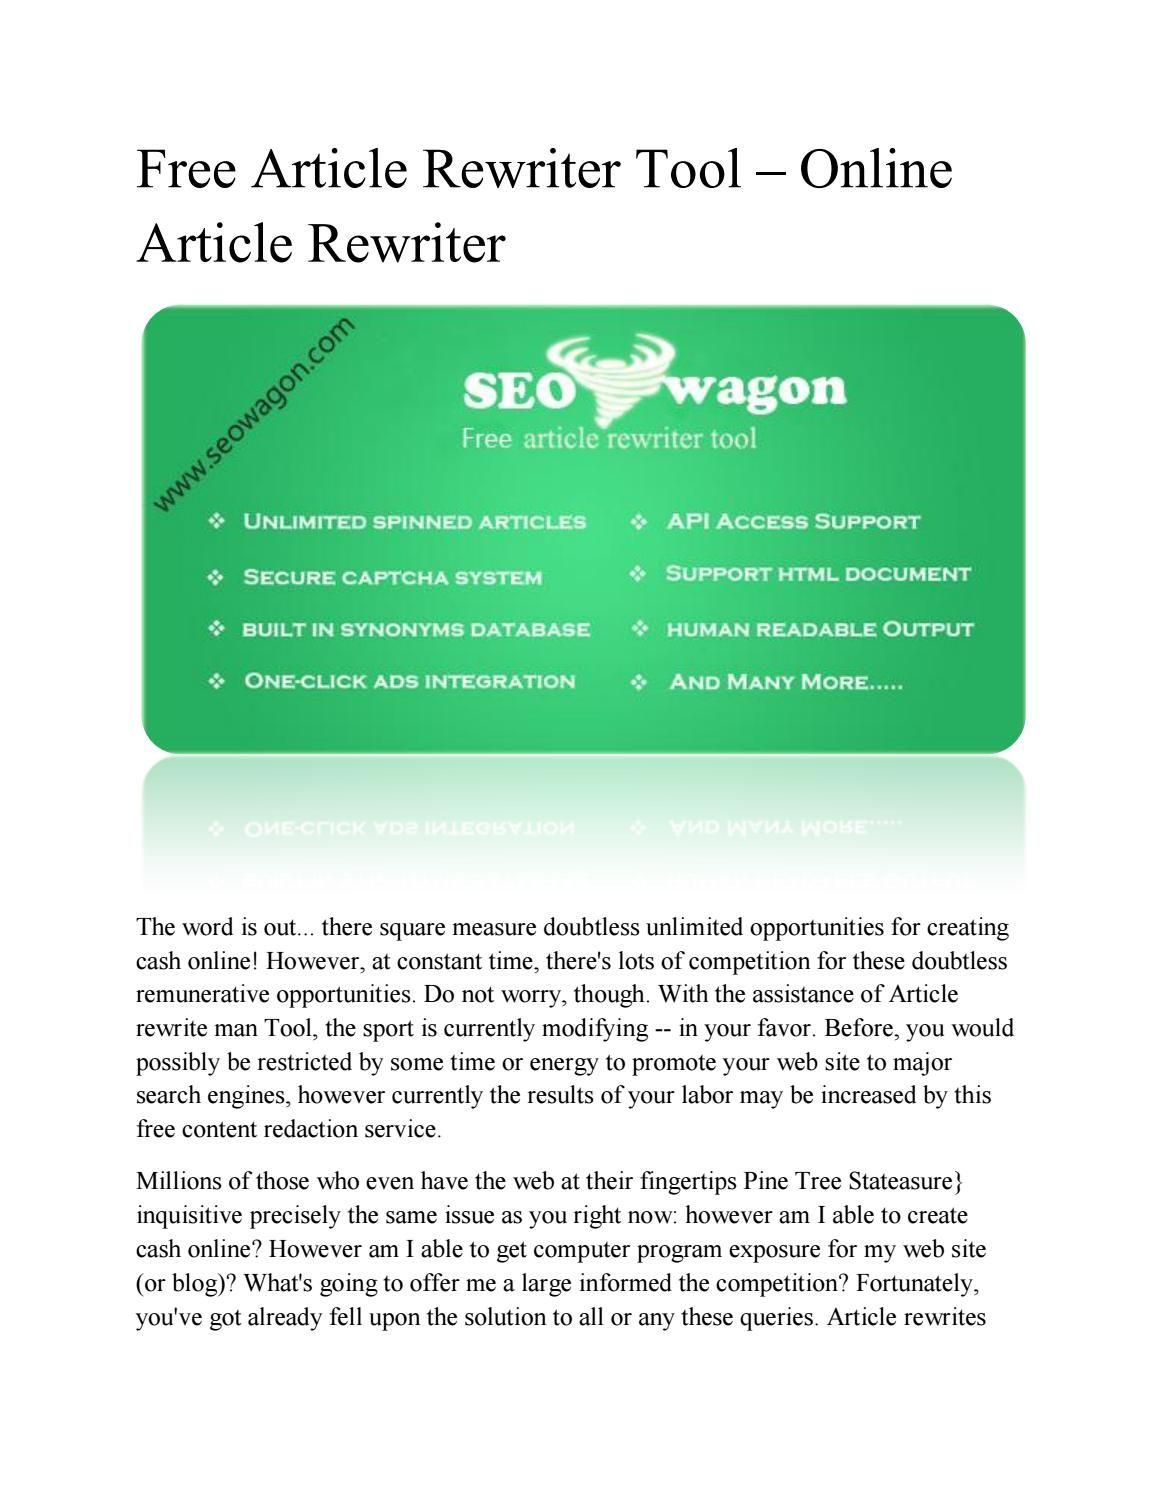 Free Article Rewriter Tool Online Article Rewriter Tool